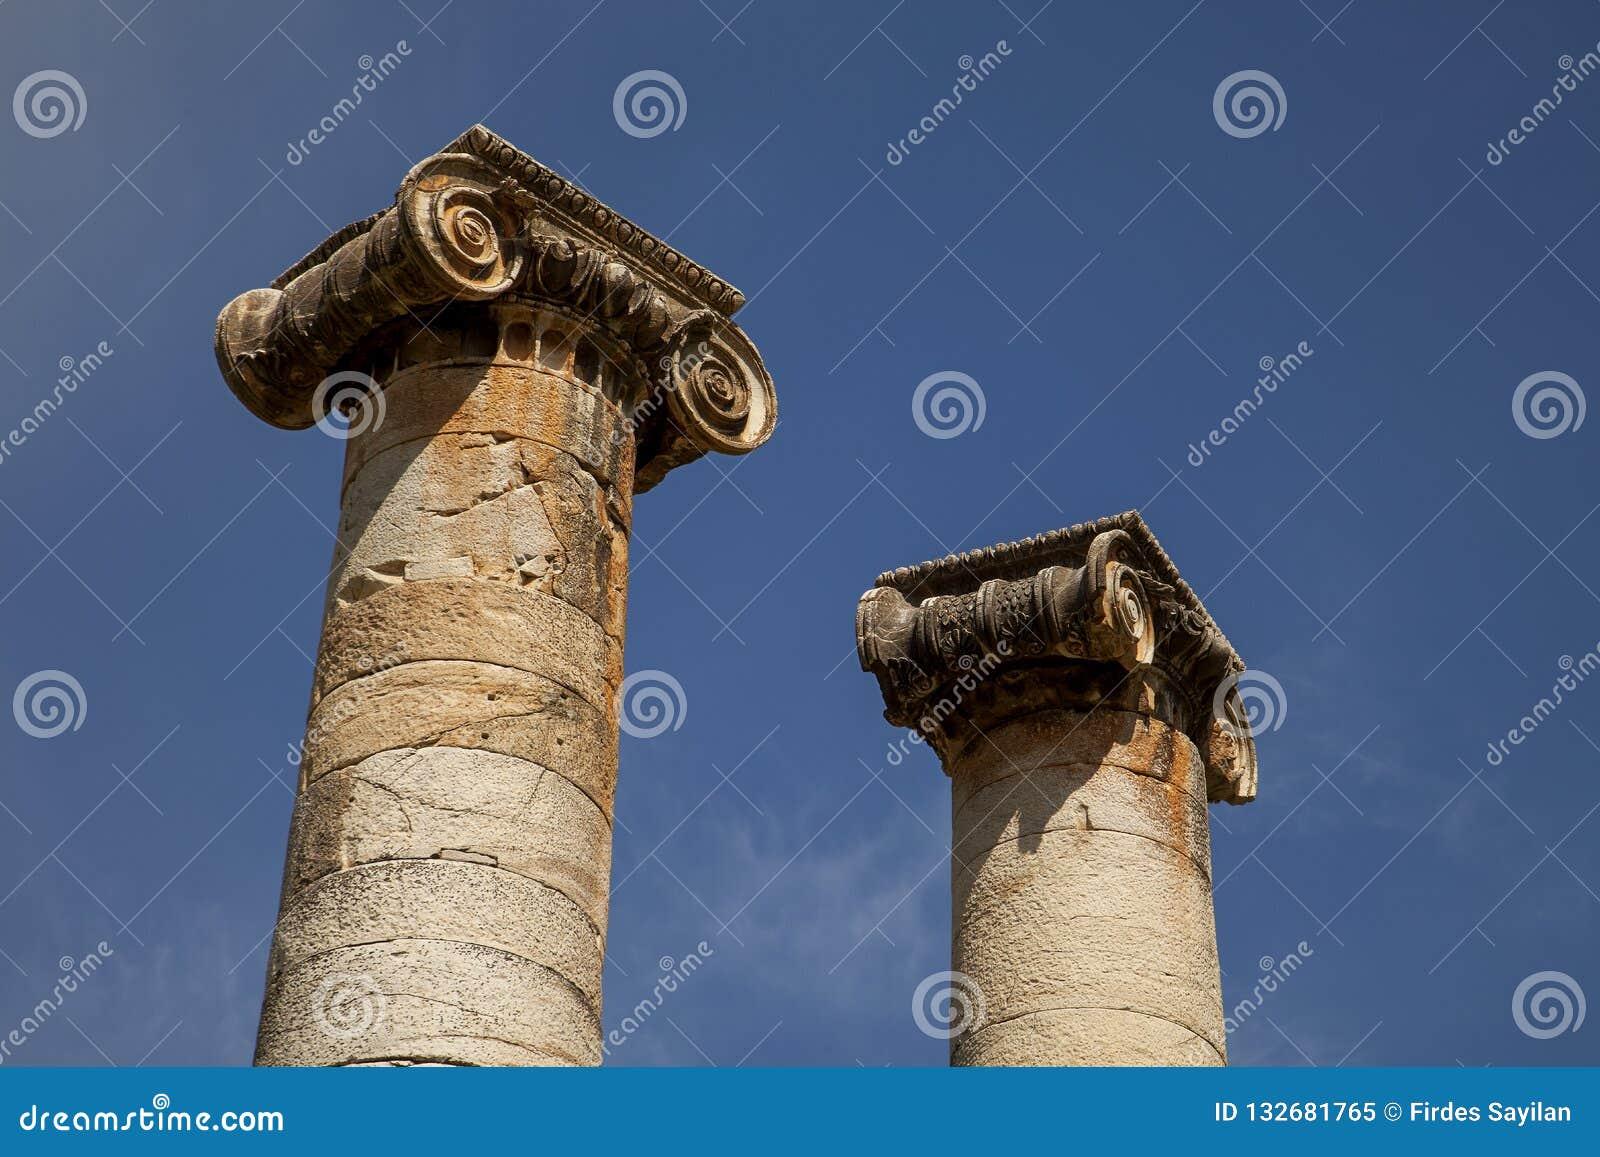 Sardis stock photo. Image of lydia, architecture